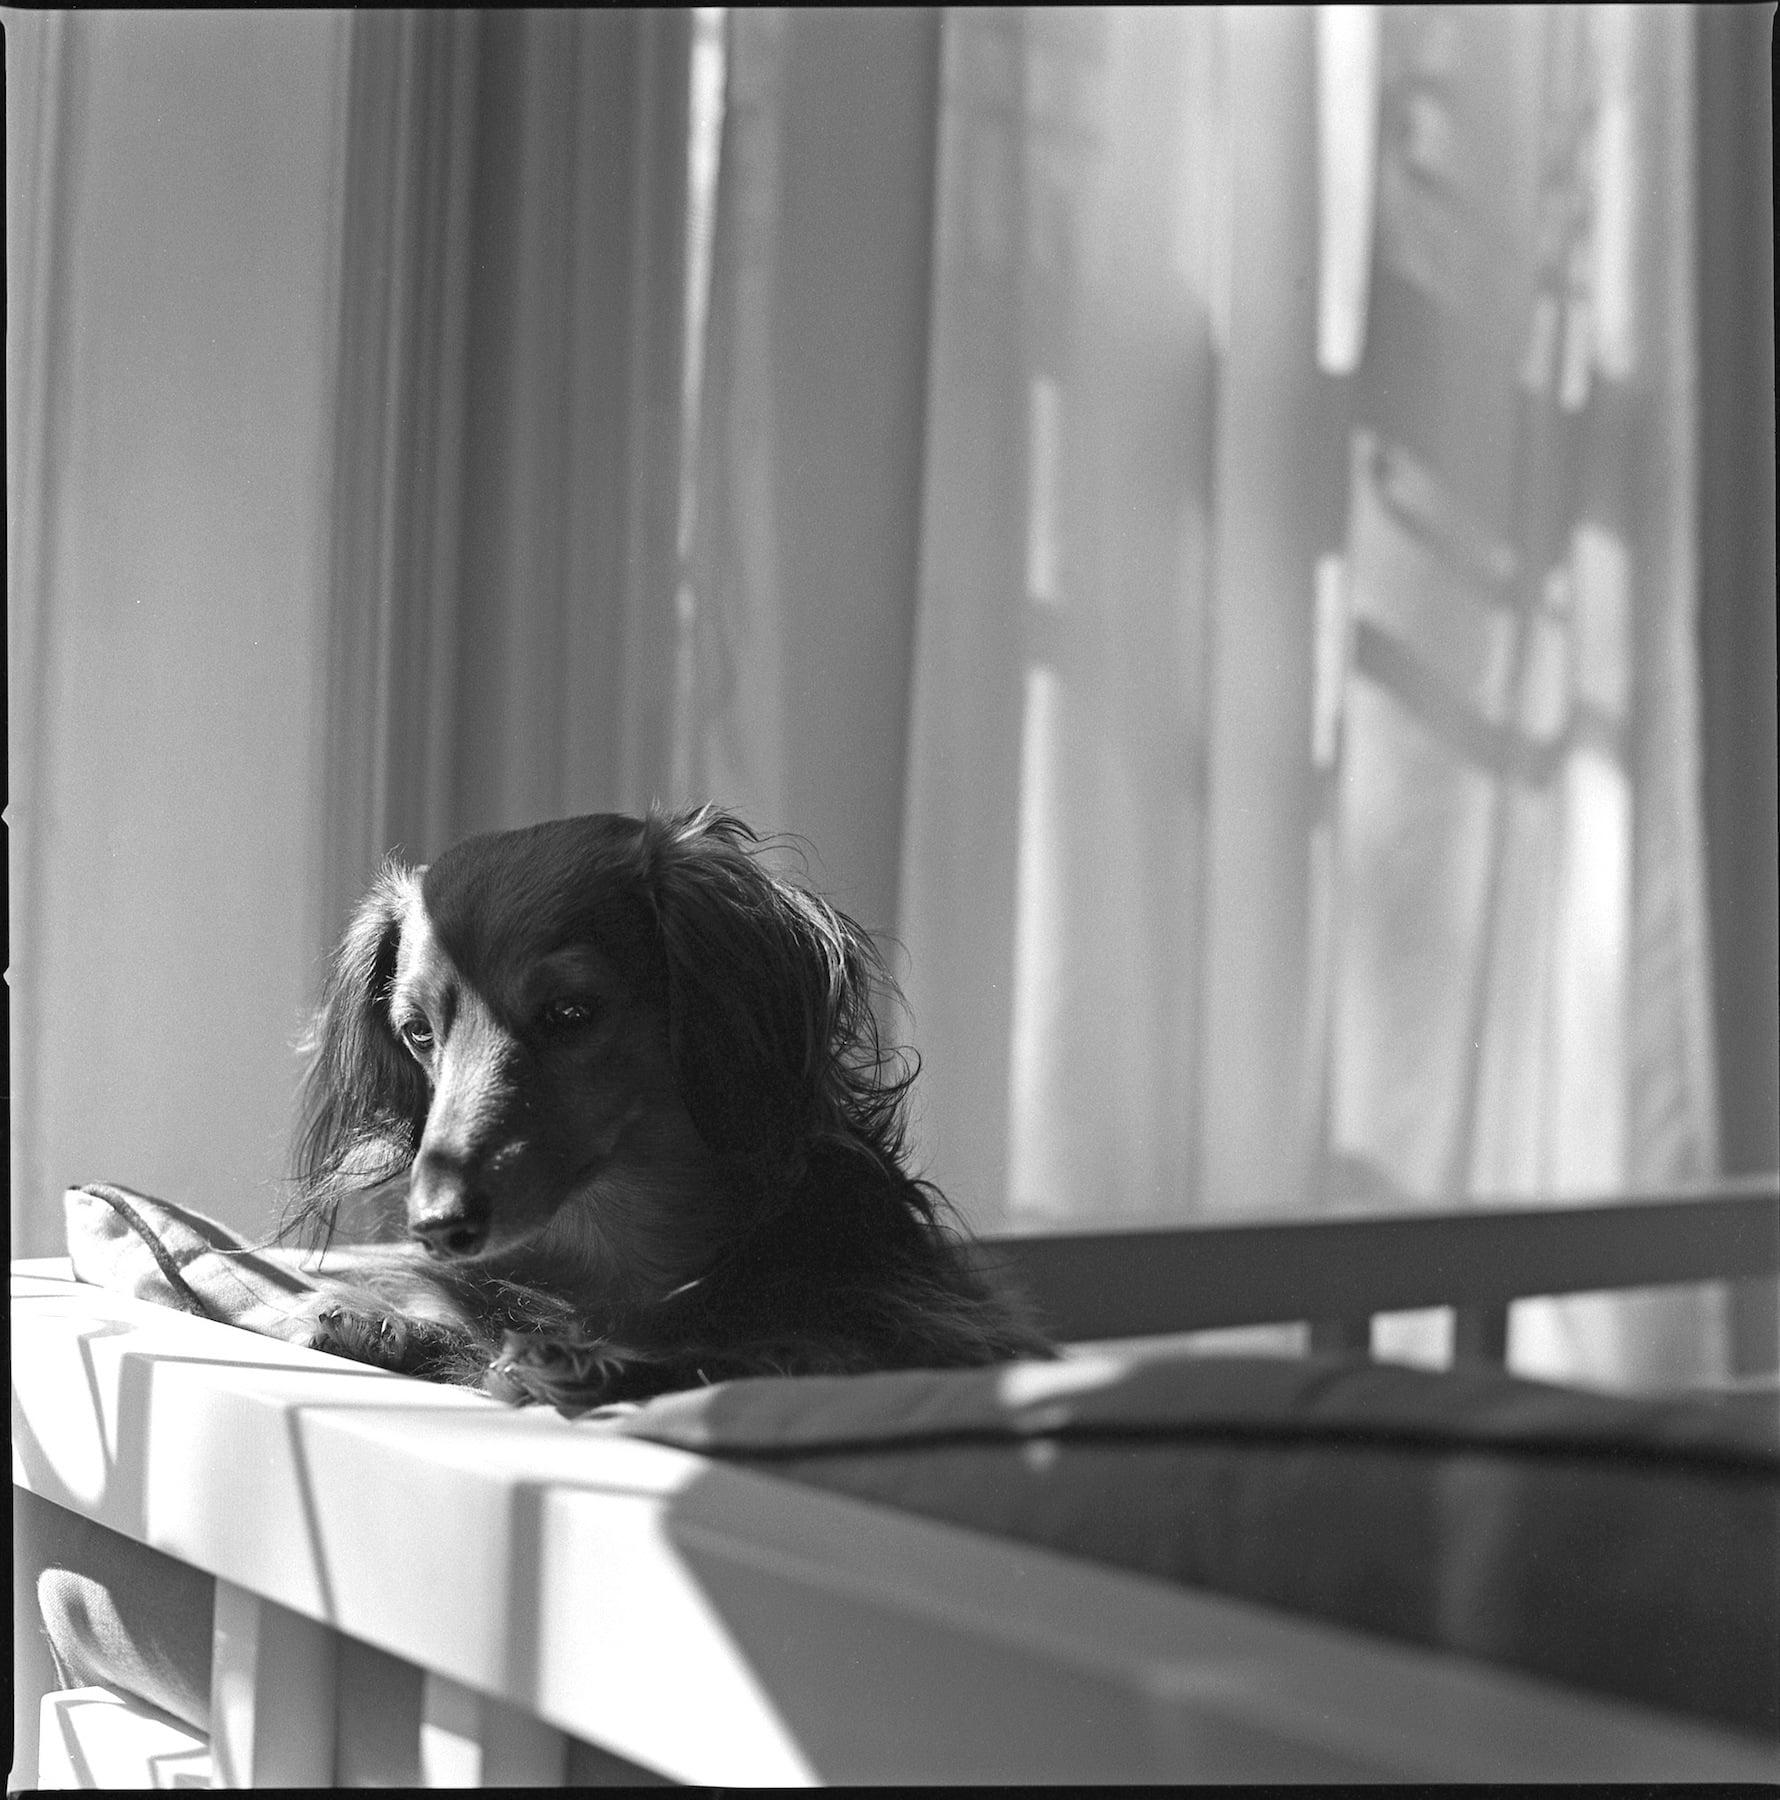 Chloe Contemplating | Hasselblad 501cm | Zeiss 80mm f2.8 | Kodak Tri-X 400 | Shawn Hoke